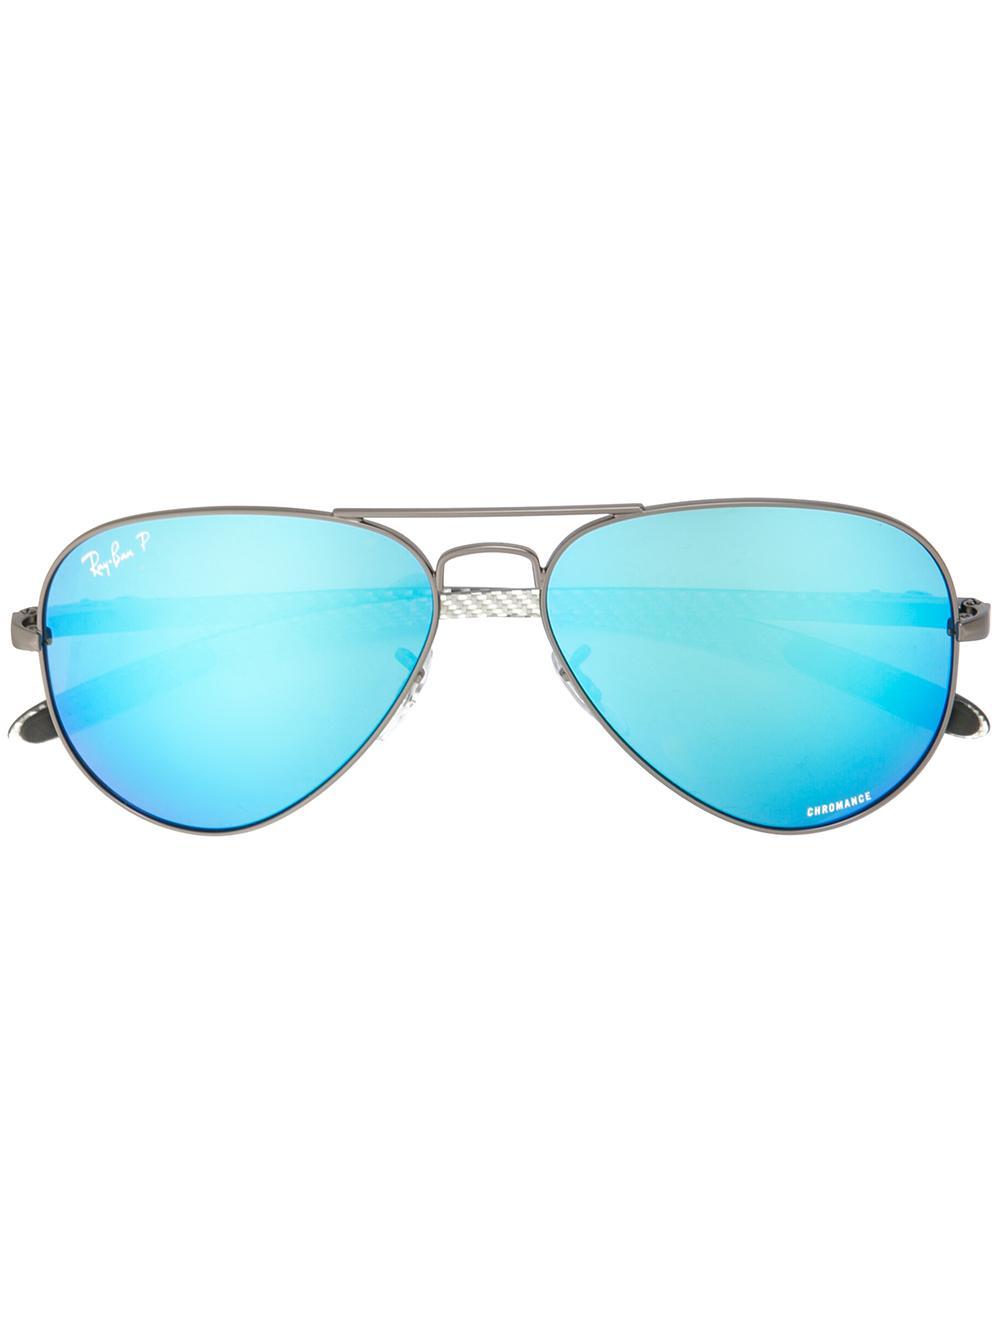 Chromance Mirrored Aviator Sunglasses Item # 0RB8317CH-029/A158